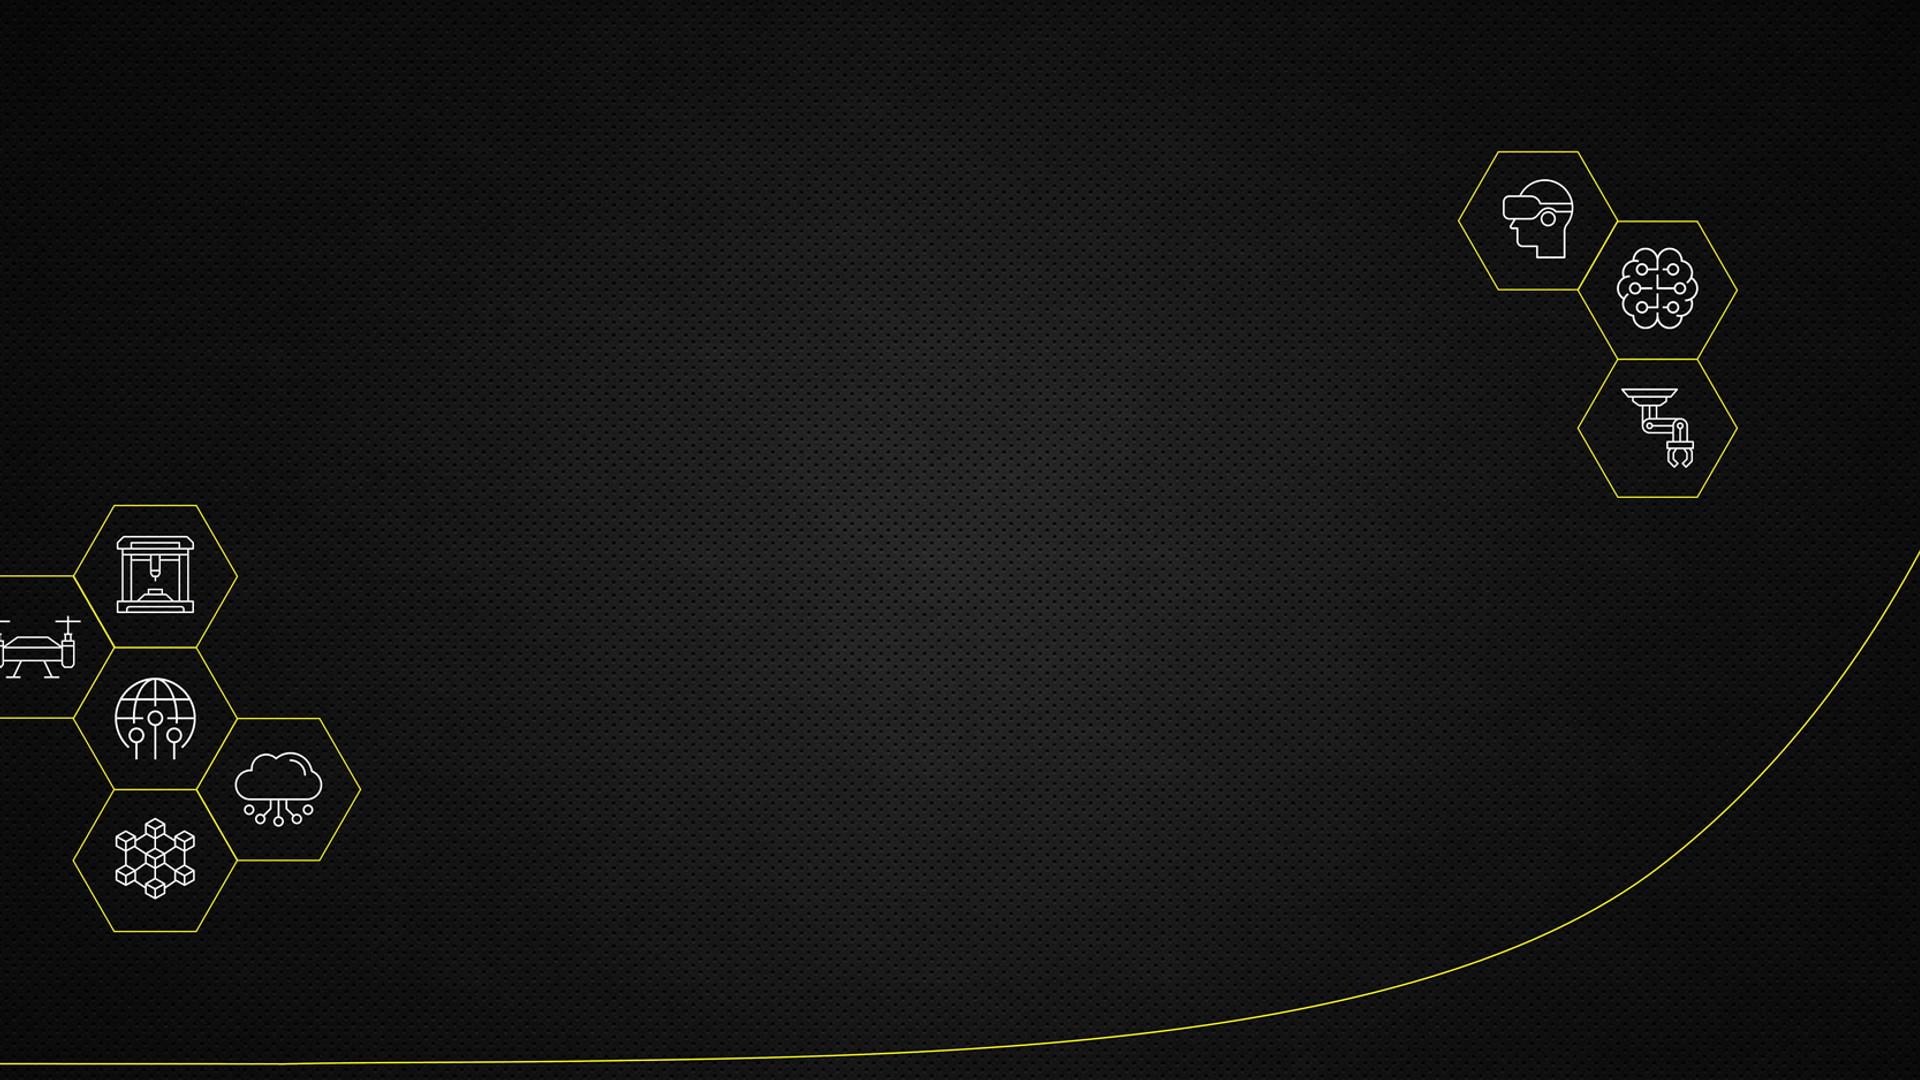 20201120_Square_Web_Background.jpg